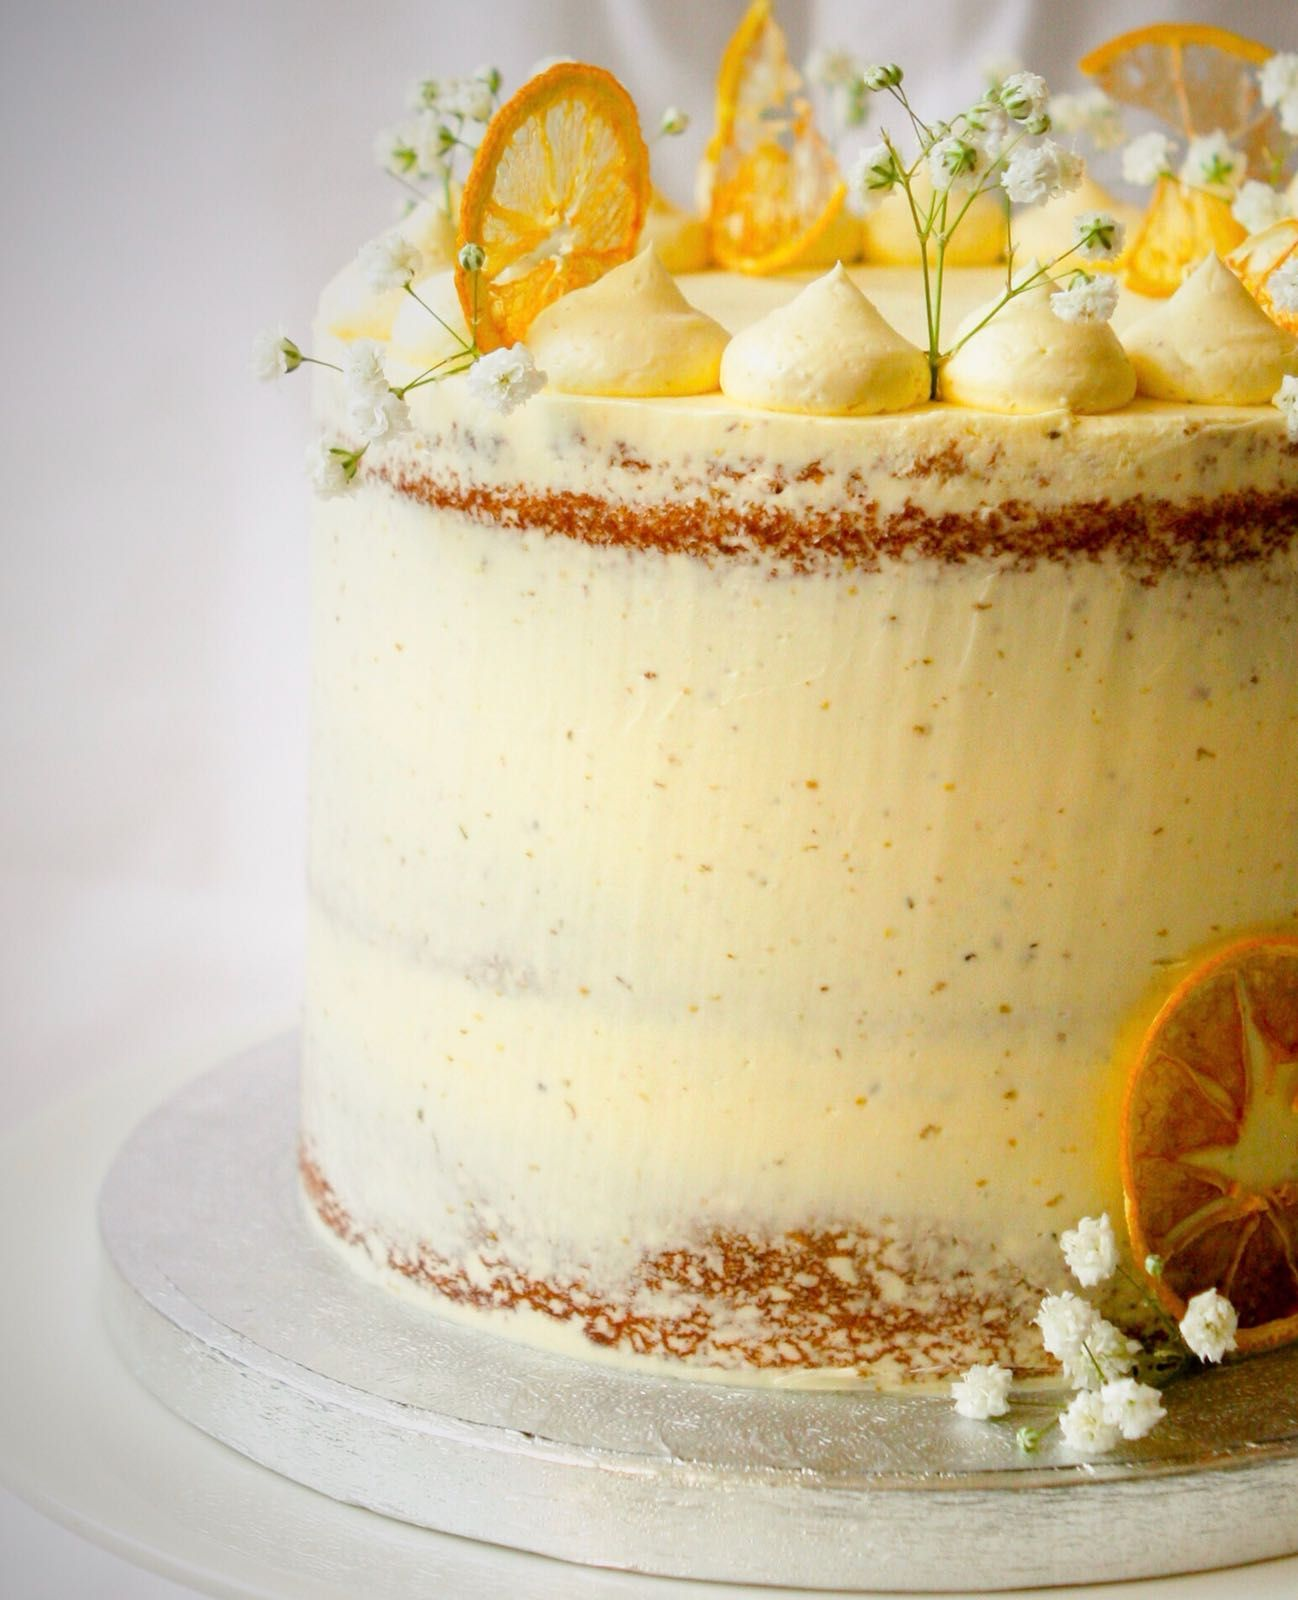 Sensational Lemon And Elderflower Cake Lemon Birthday Cakes Vegan Birthday Personalised Birthday Cards Paralily Jamesorg